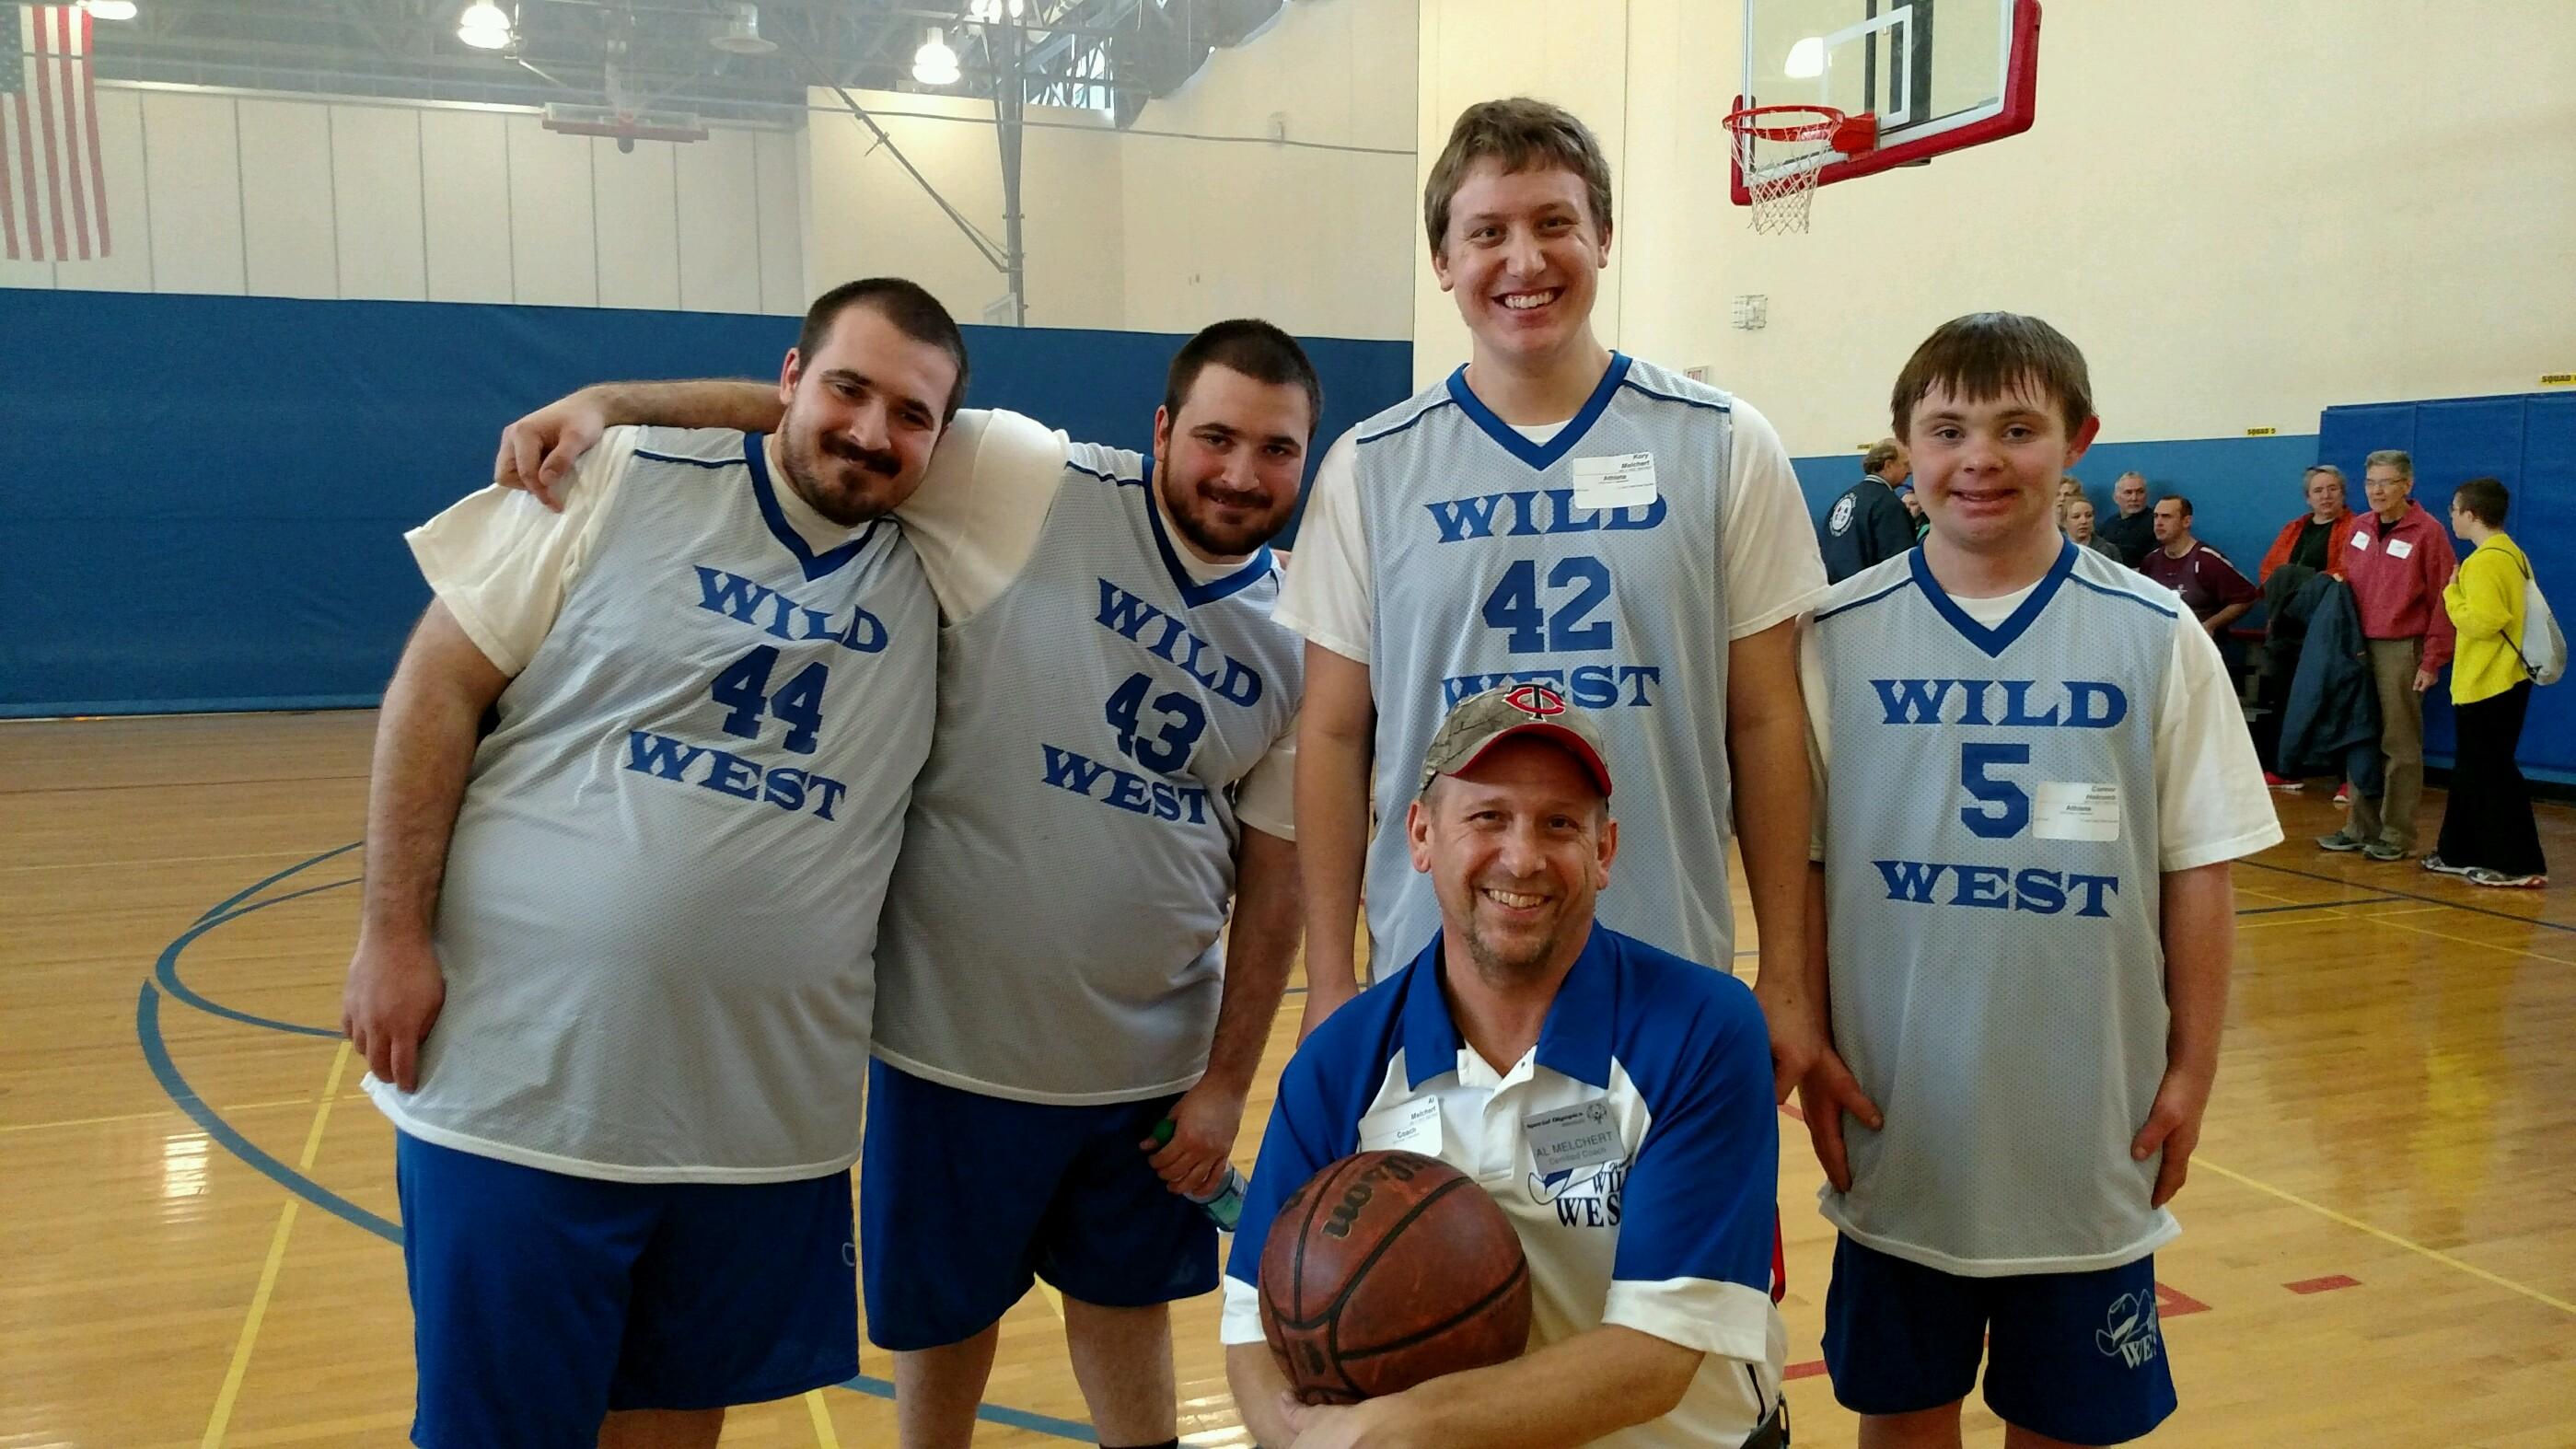 Ryan, Jeremy, Cory, Connor & Al